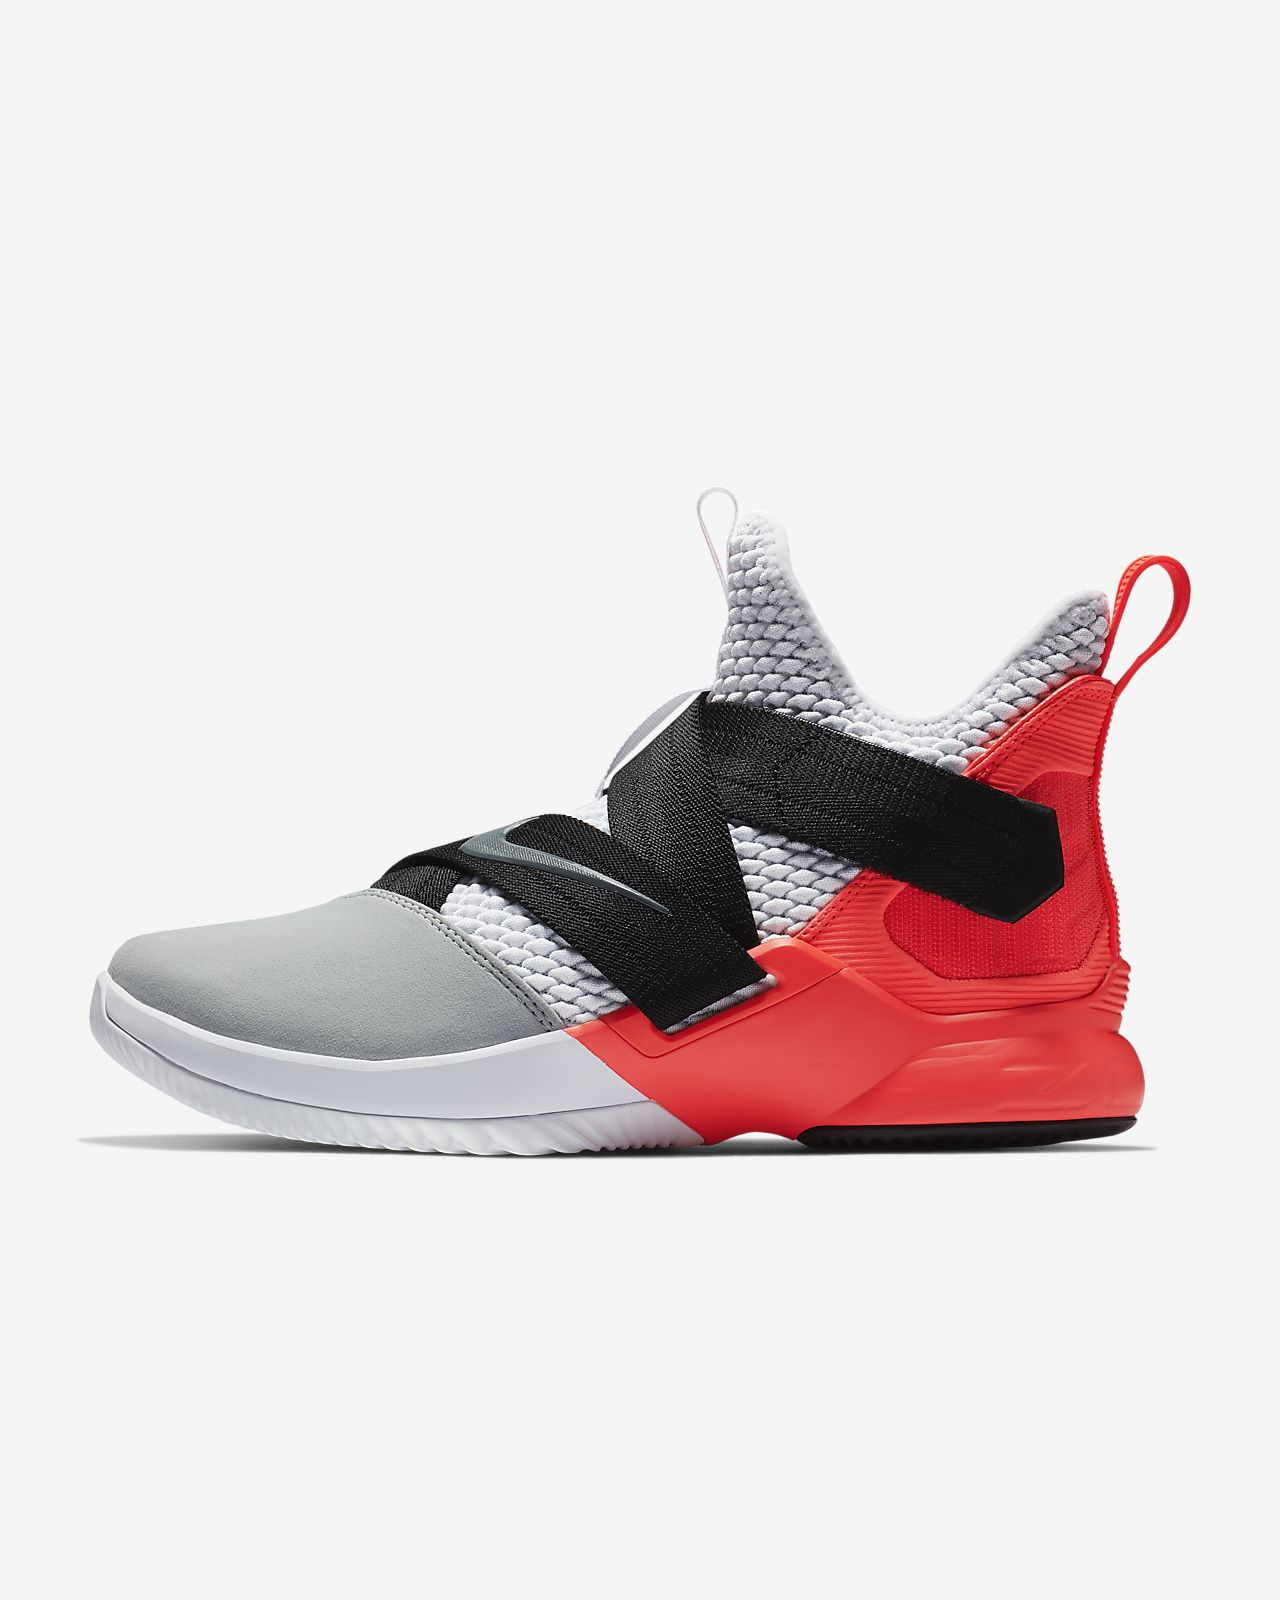 premium selection dc186 9398d Basketball Shoe. LeBron Soldier 12 SFG